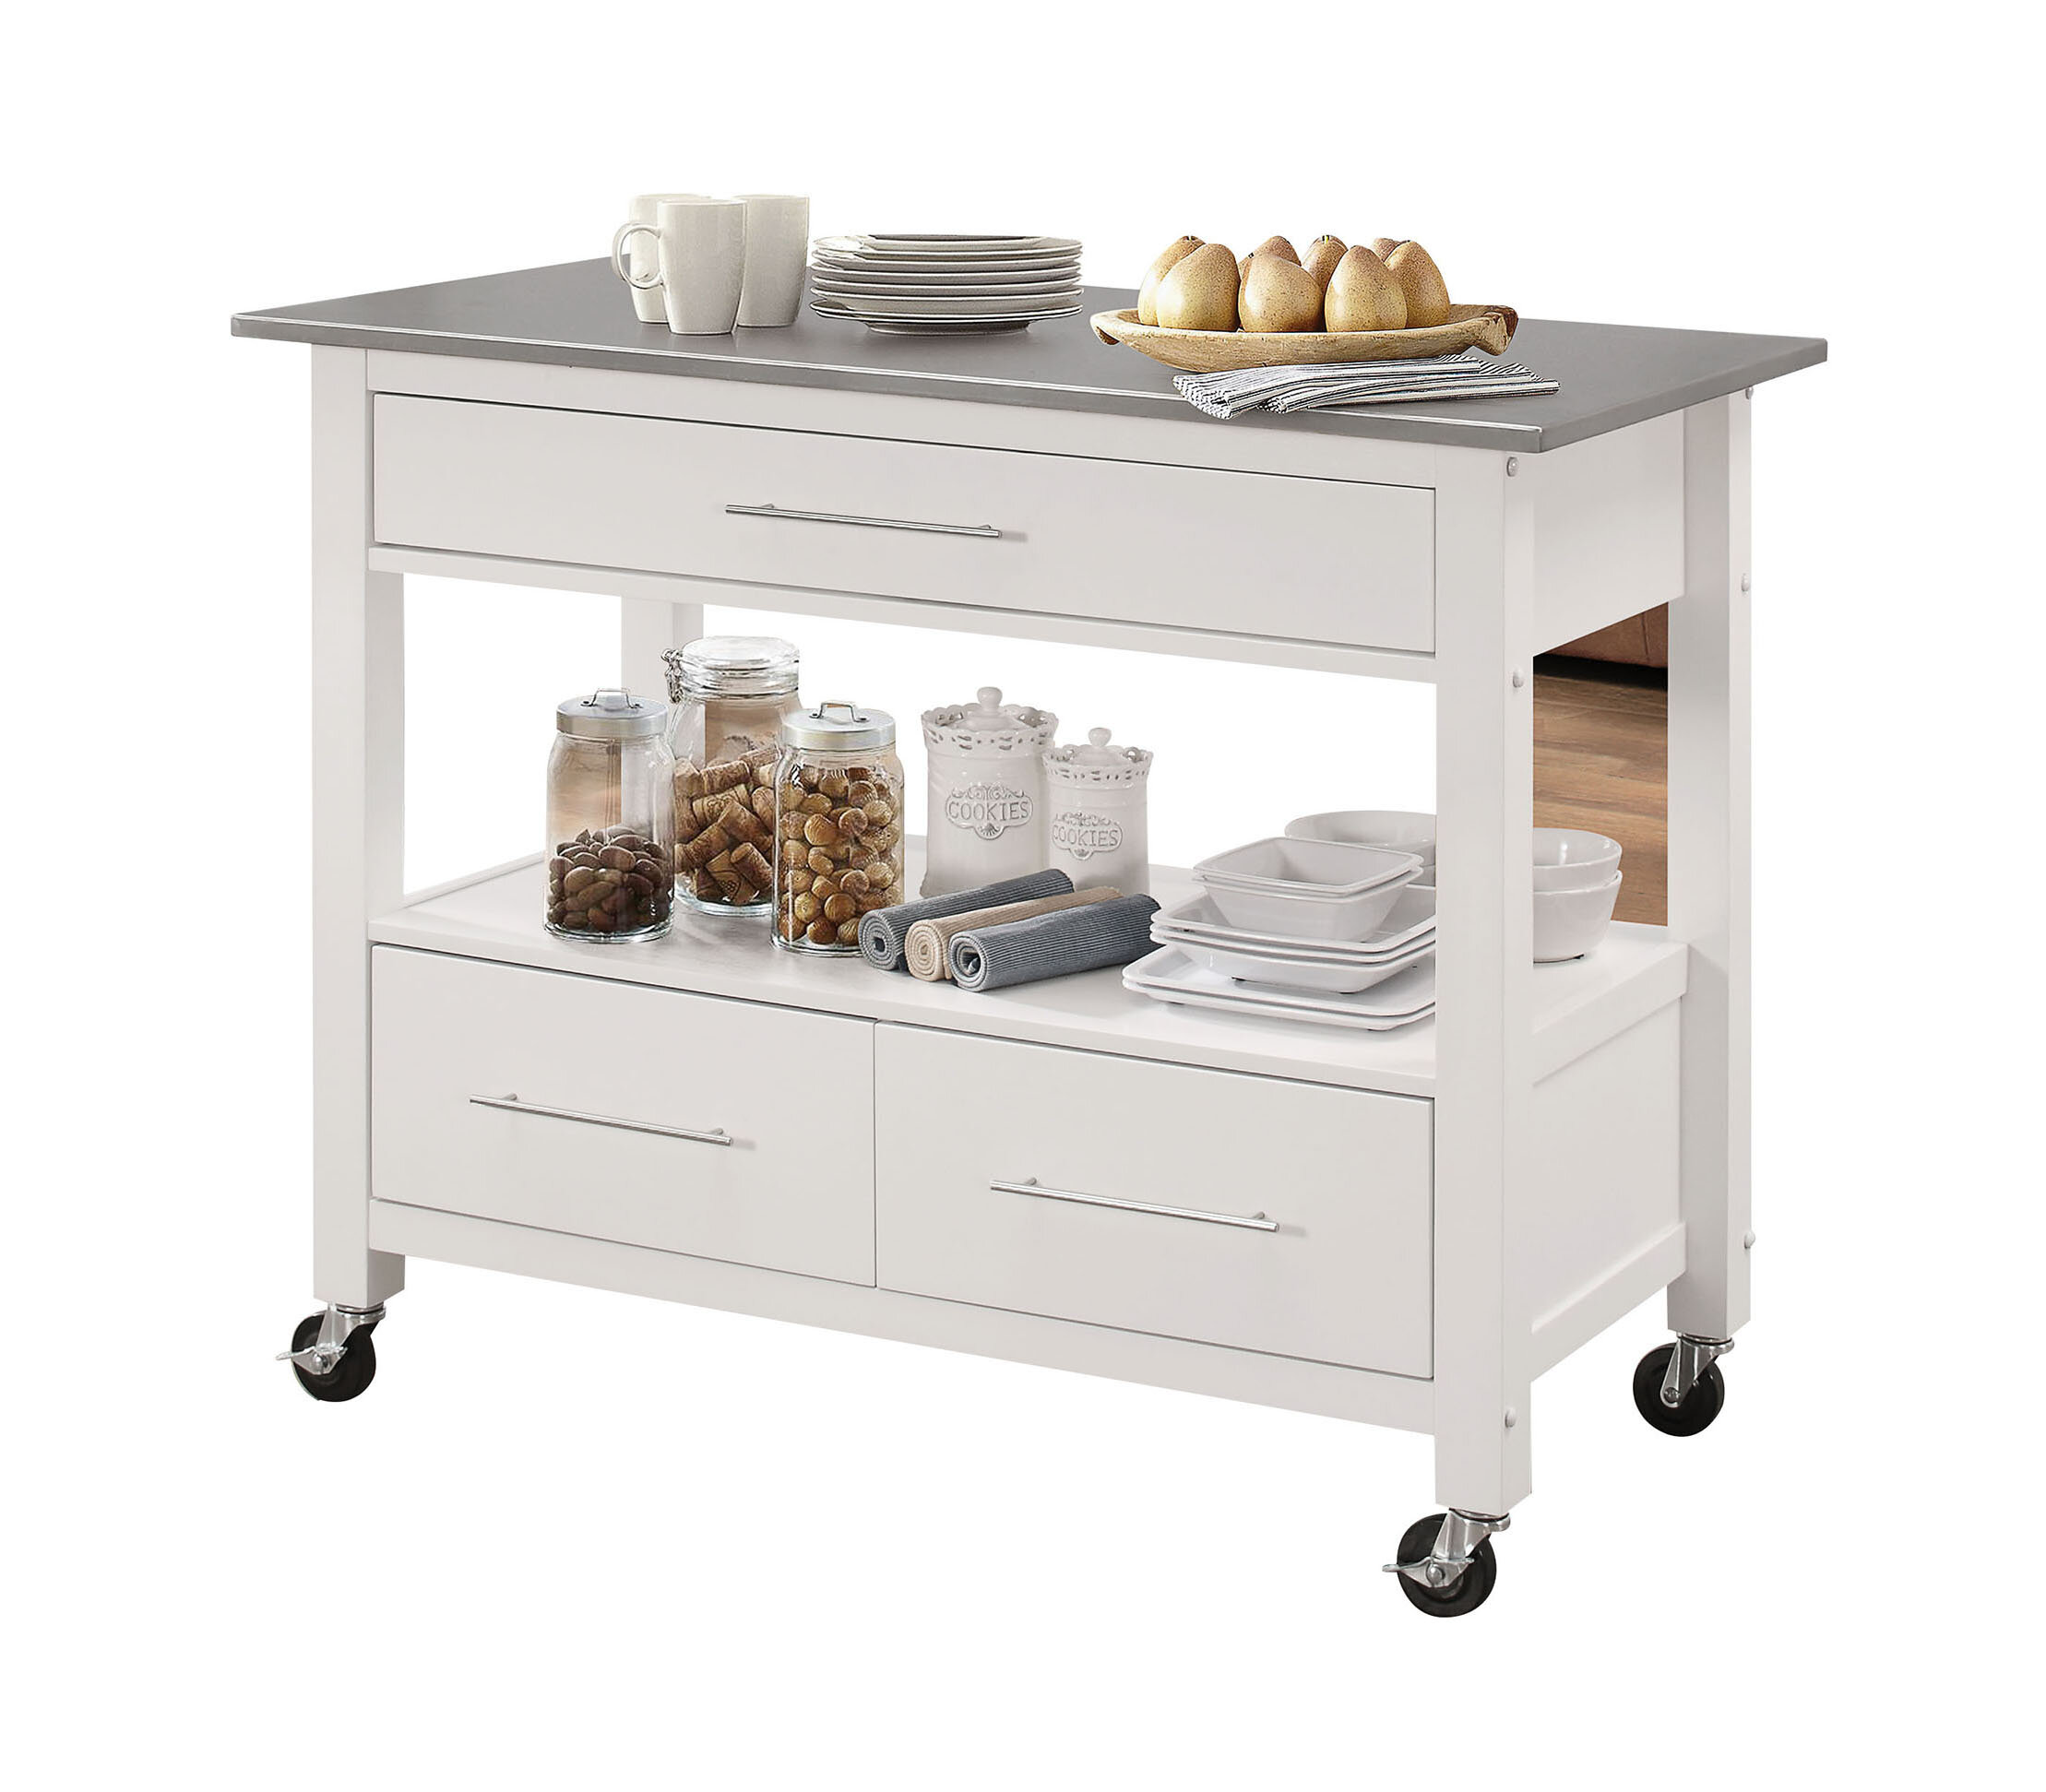 Monongah Rectangular Kitchen Cart With Stainless Steel Top Reviews Allmodern